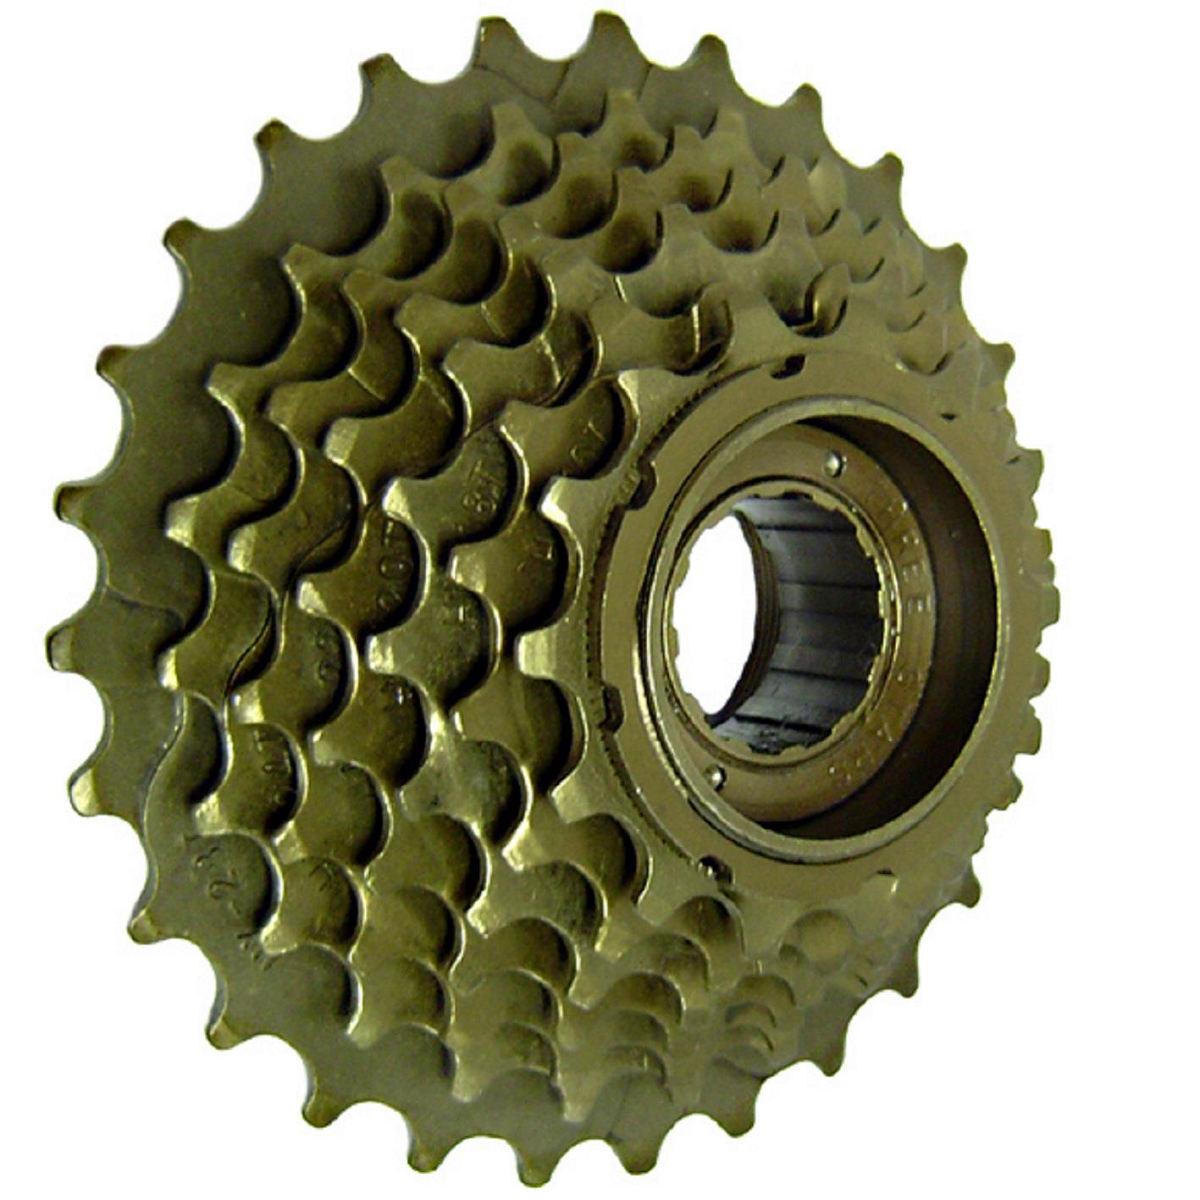 Catraca Roda Livre Bicicleta 7 velocidades 14-28 Indexada